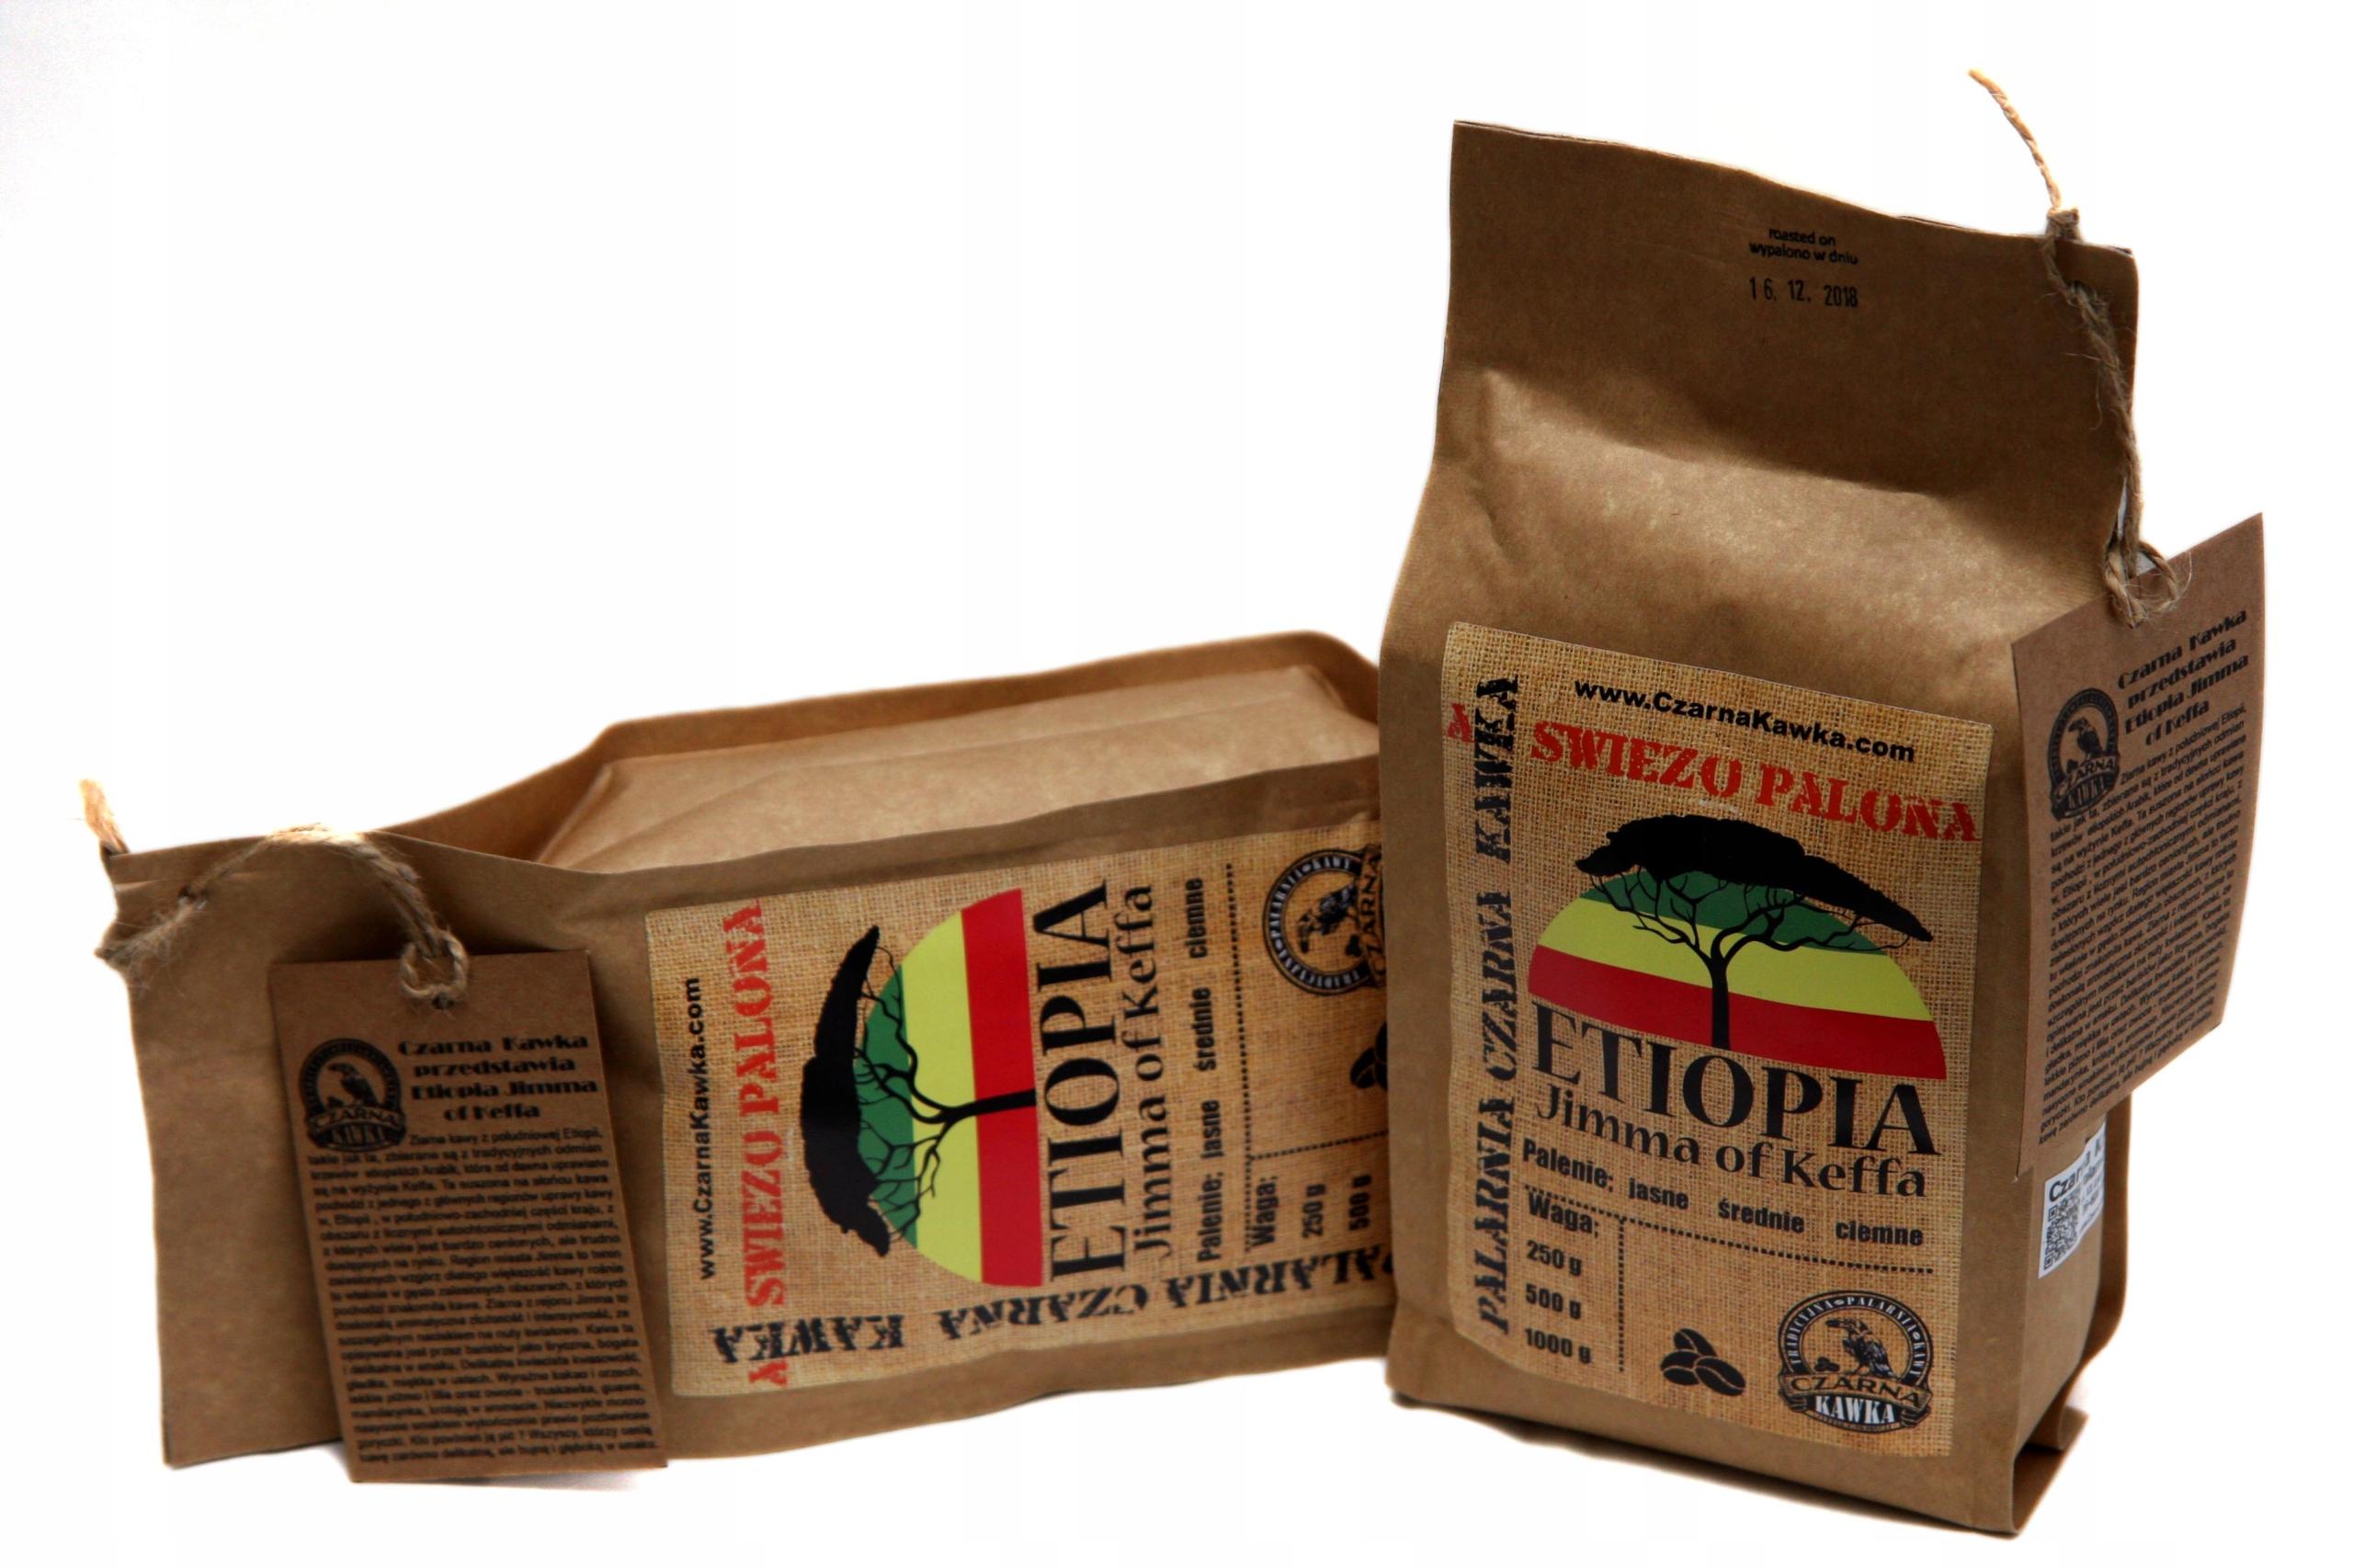 Kawa świeżo palona ETIOPIA Jimma of Keffa AA 1kg Gatunek kawy Arabica